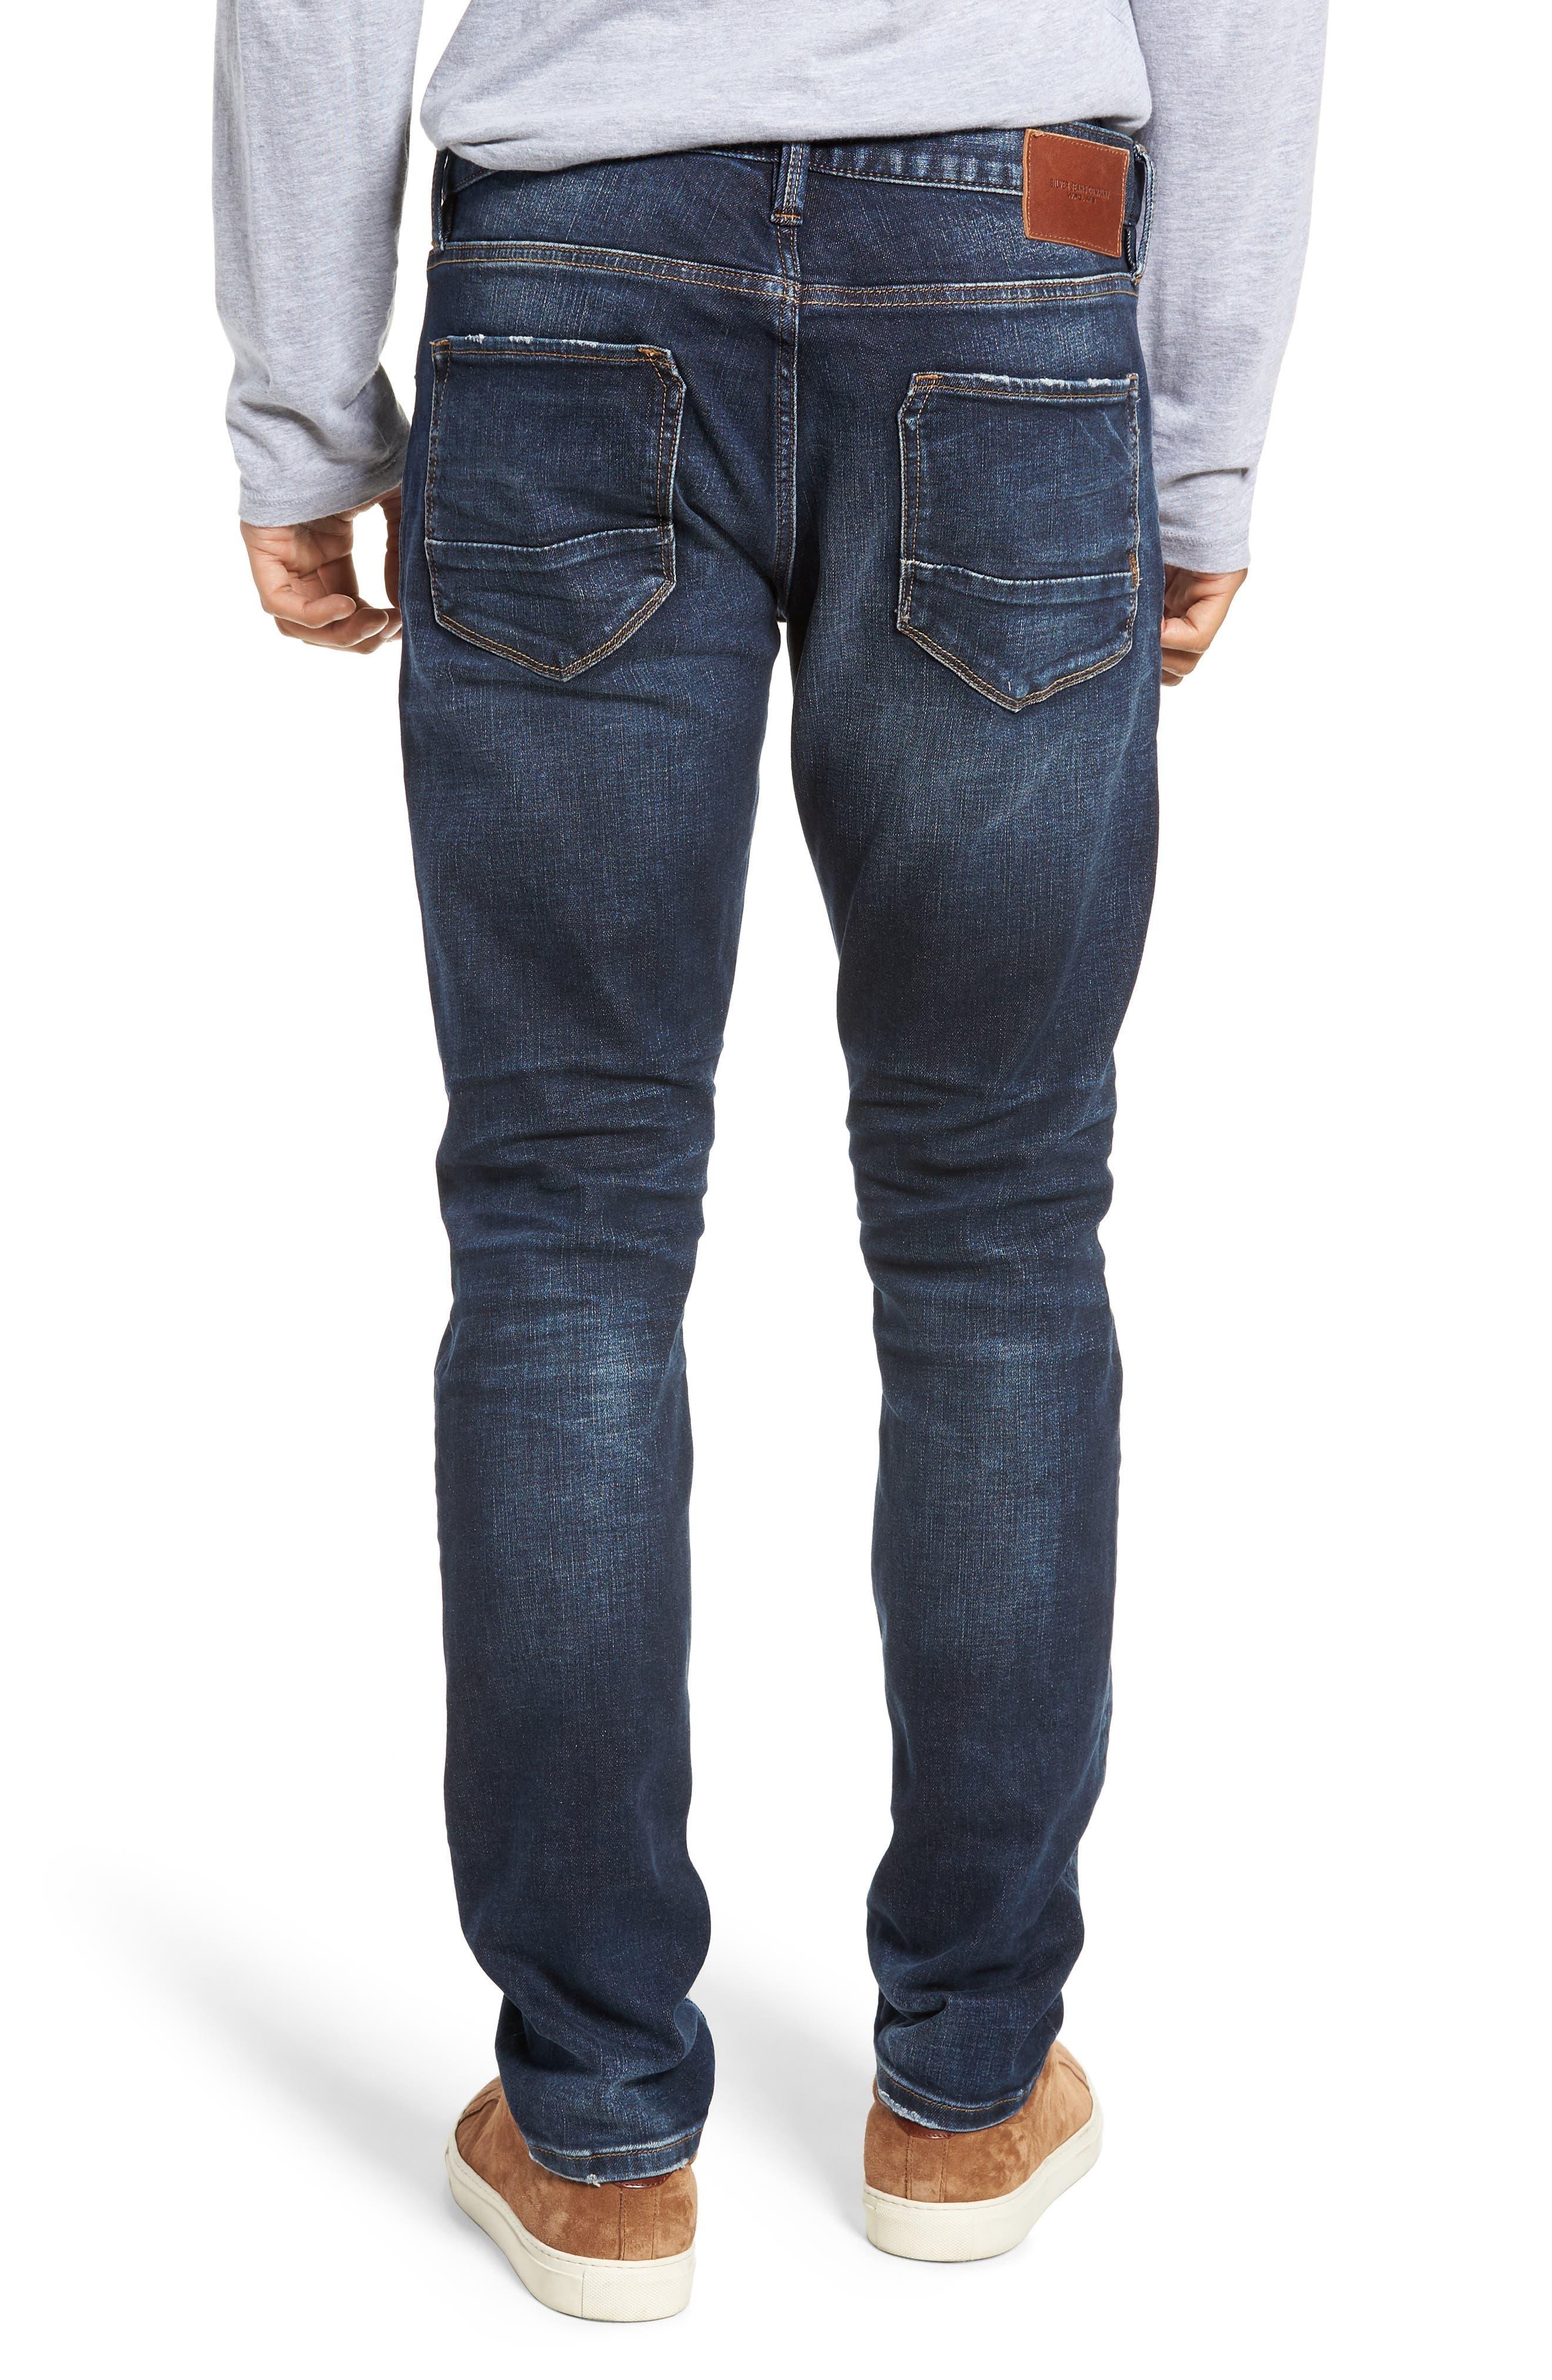 SILVER JEANS CO.,                             Ashdown Slim Straight Fit Jeans,                             Alternate thumbnail 2, color,                             INDIGO